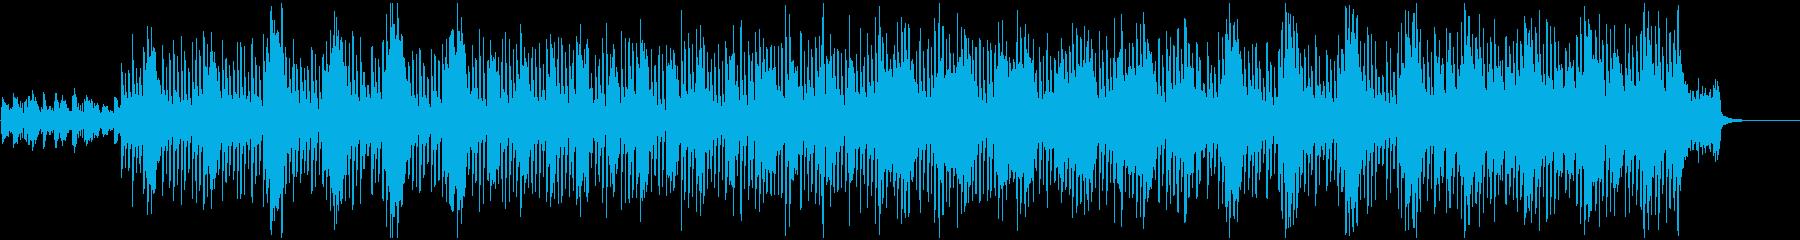 SF感のある宇宙的BGMの再生済みの波形